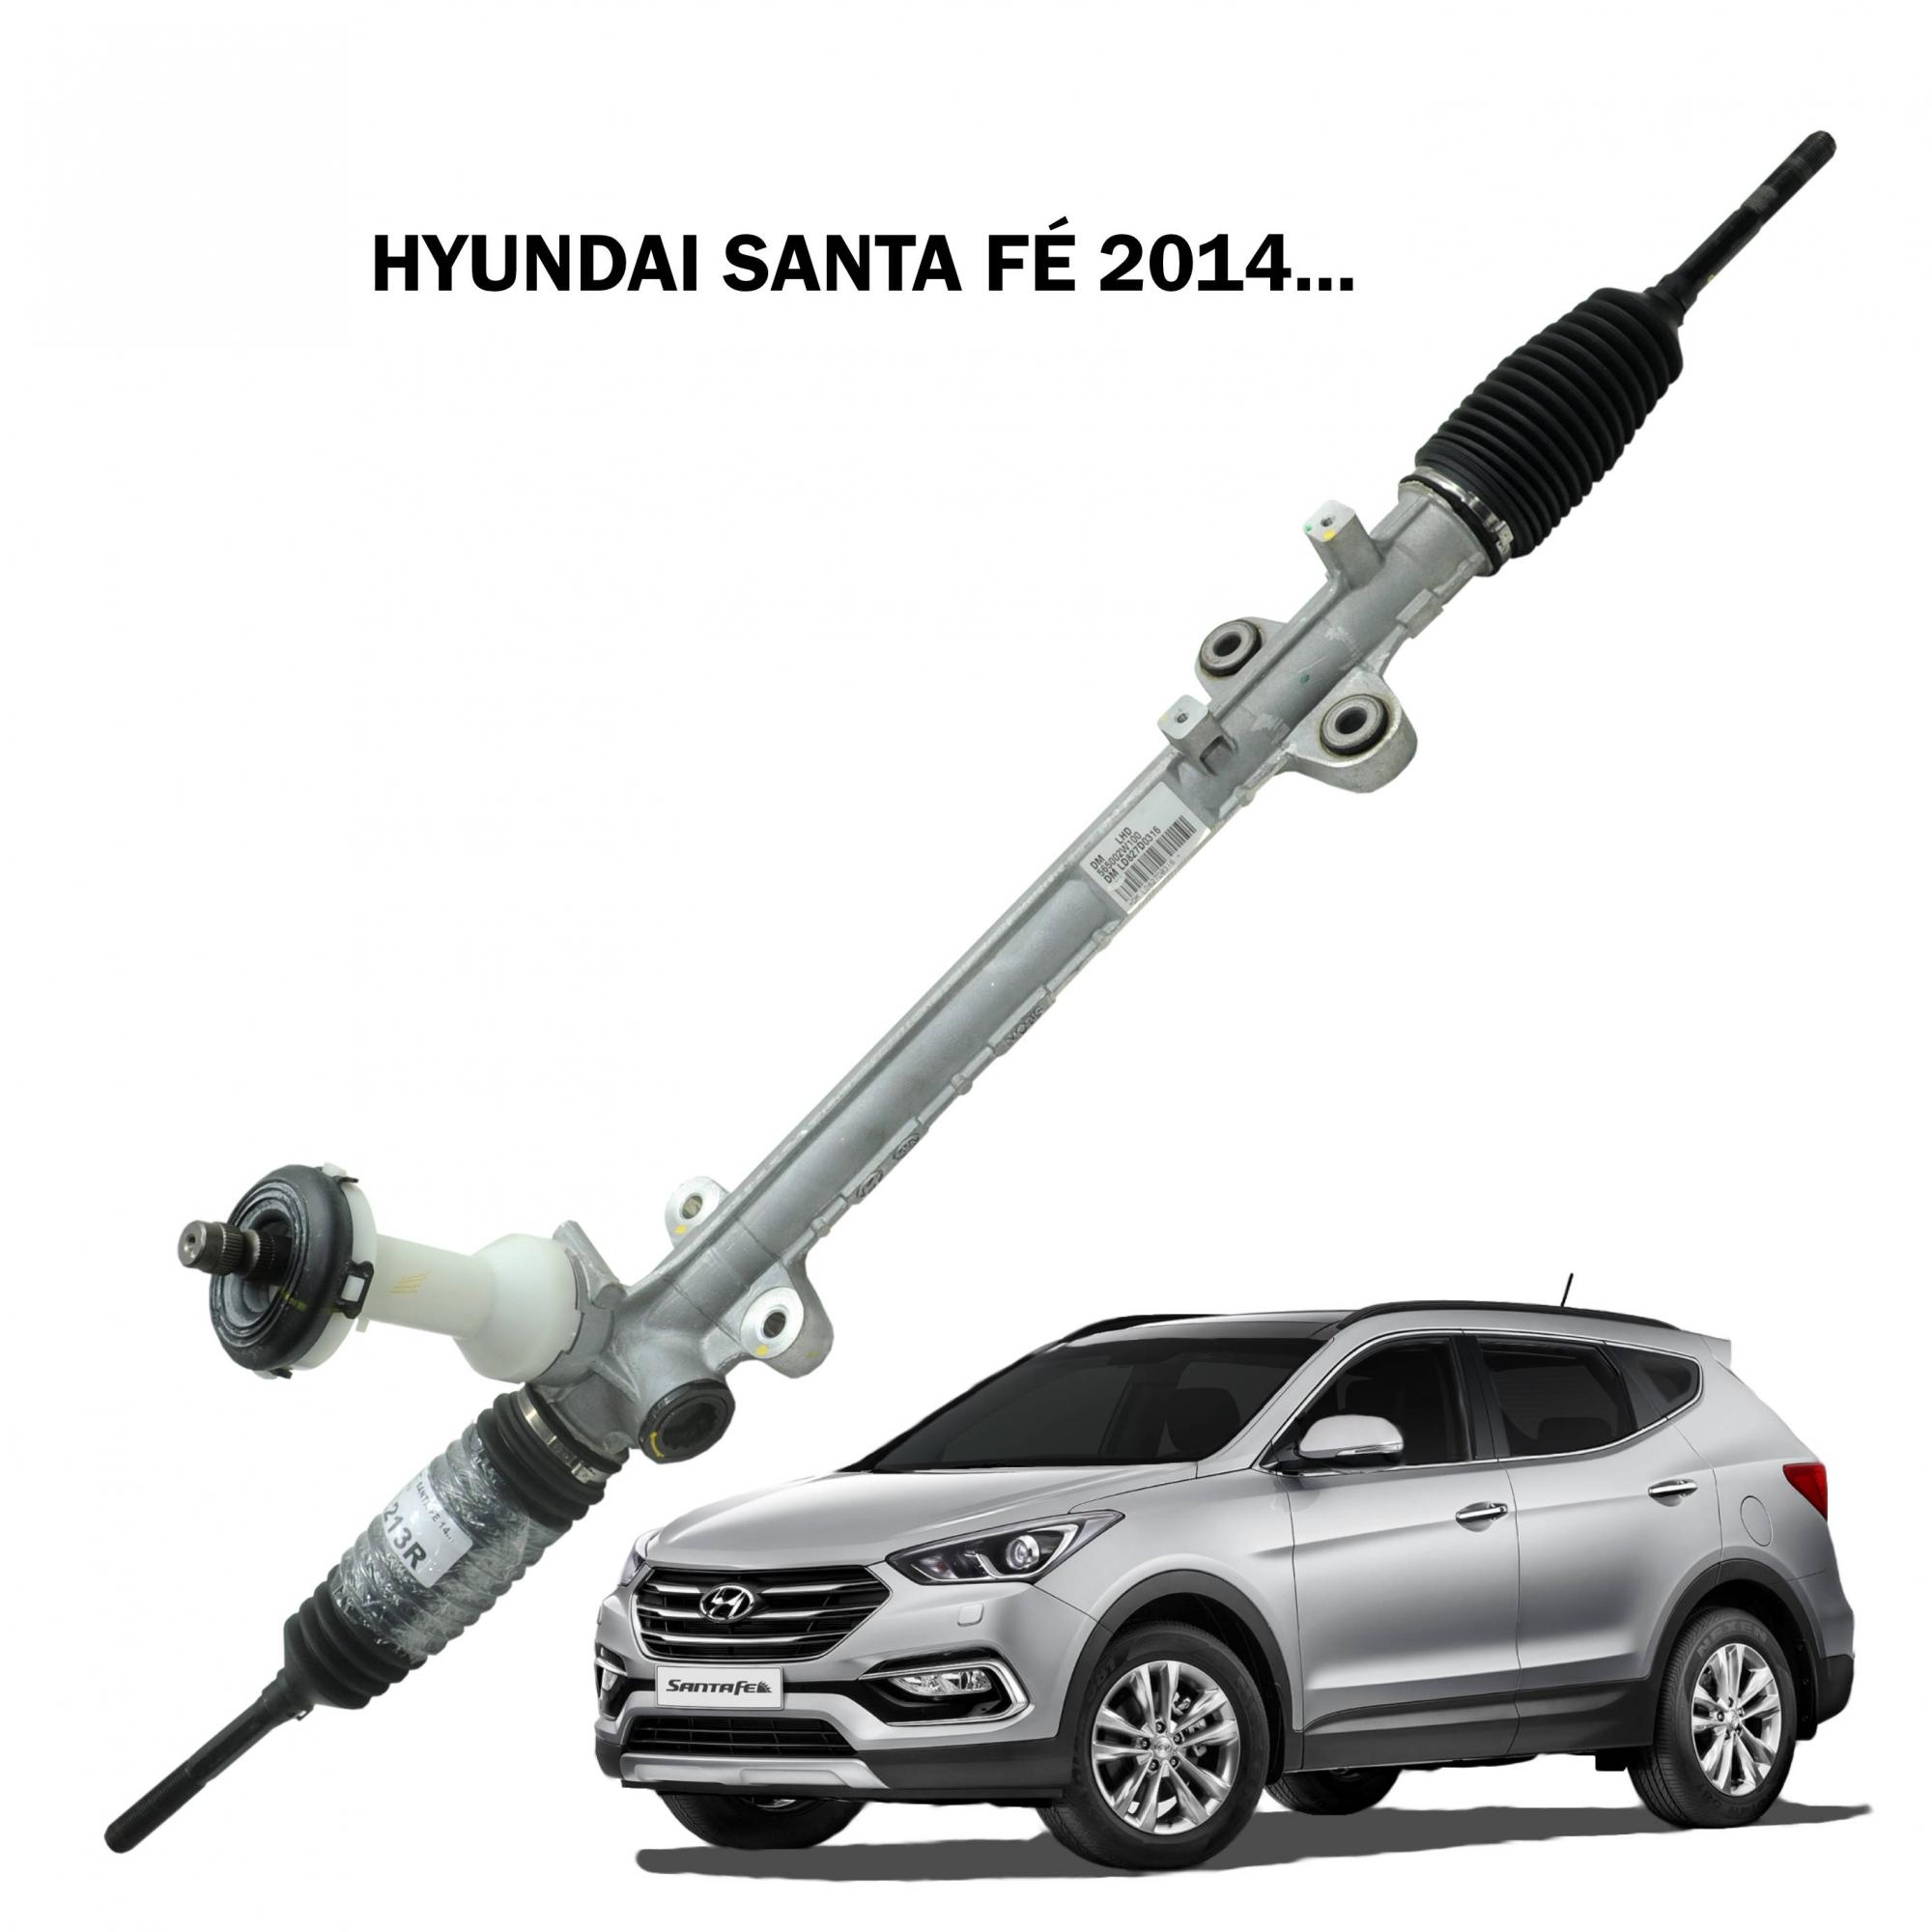 Caixa Direção Hyundai Santa Fé 2014... (Sistema Elétrico) 56500-2W100